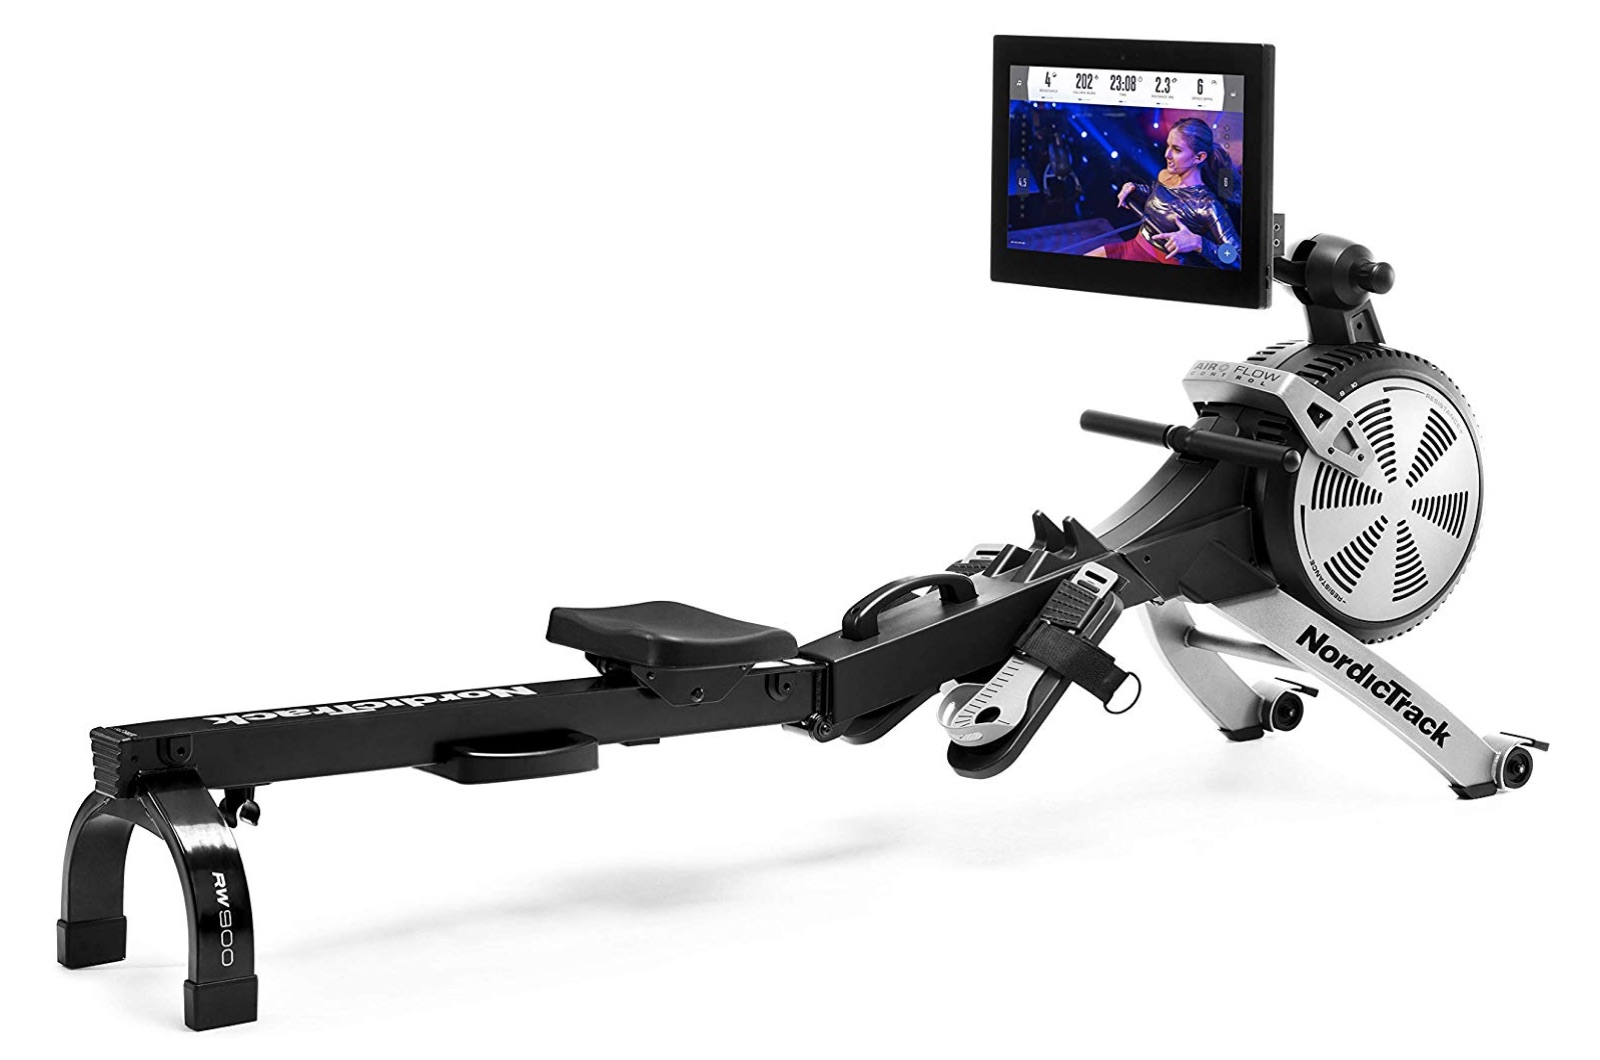 RW900 Rower Build Quality